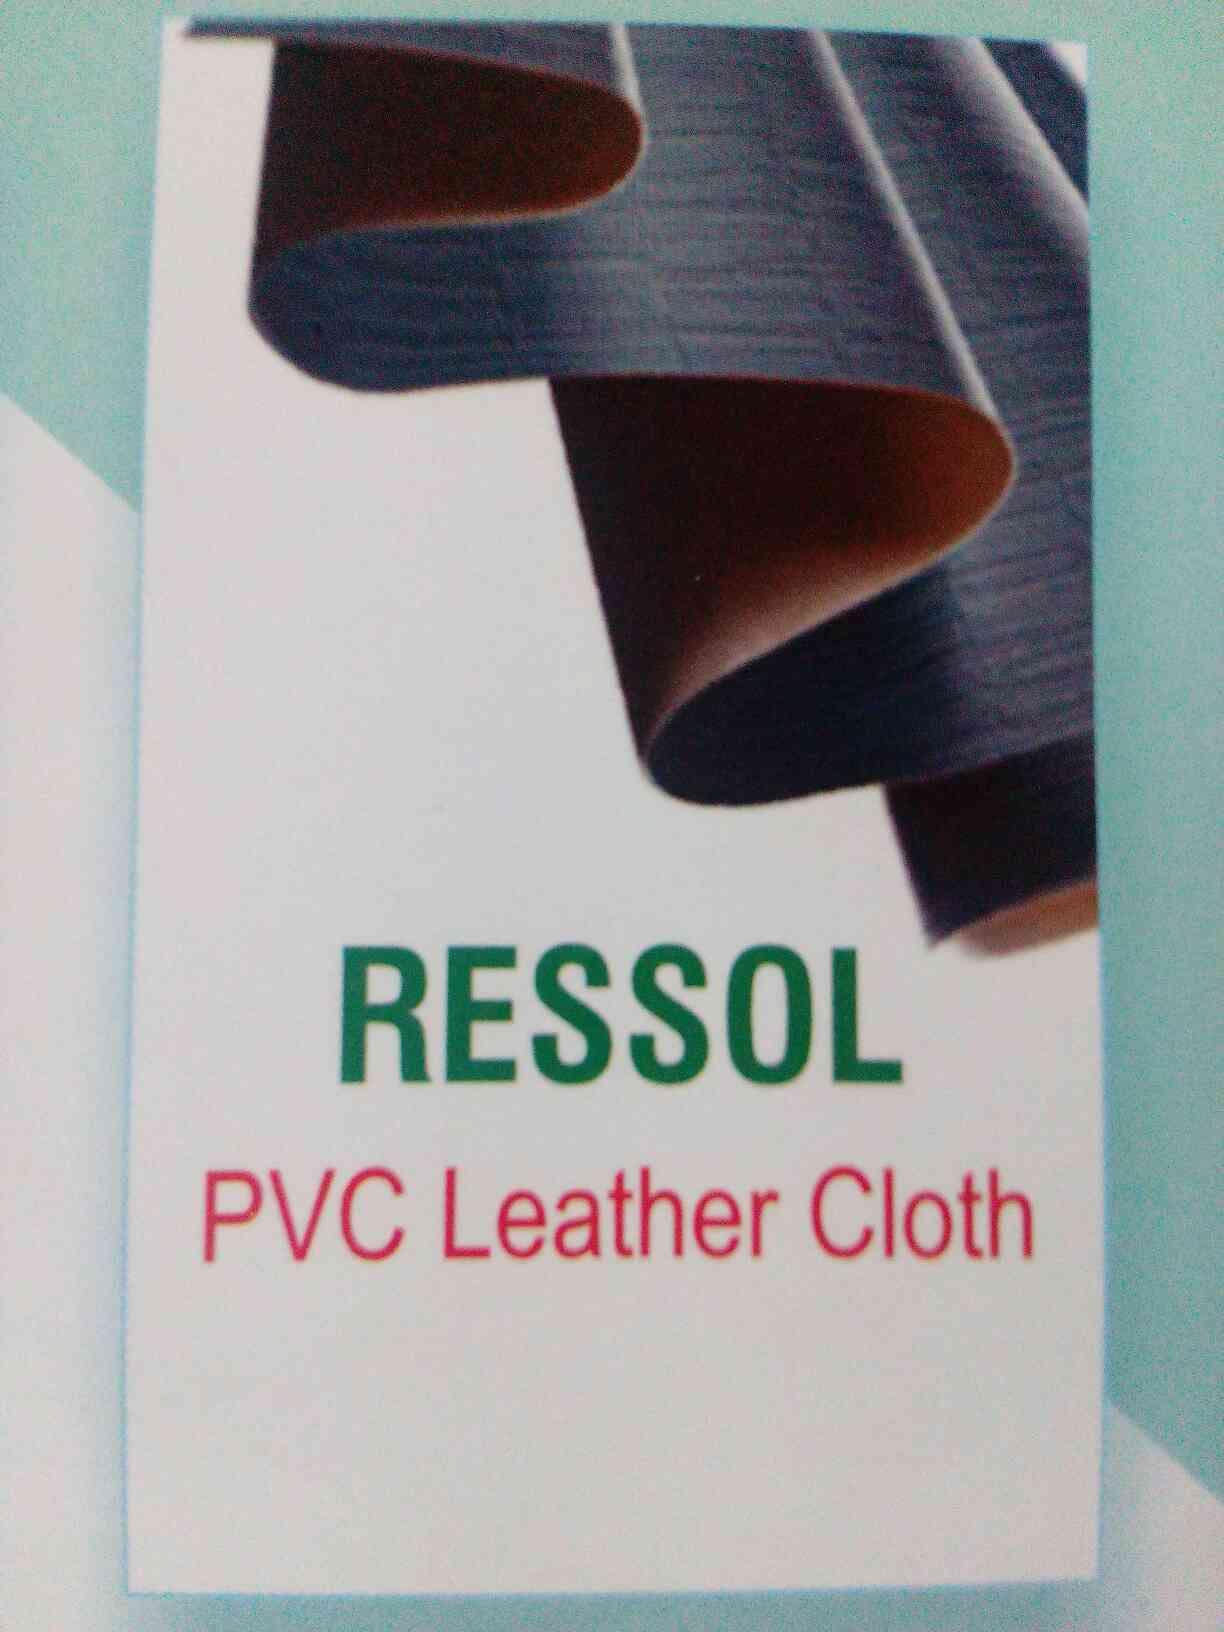 ressol pvc leathe cloth